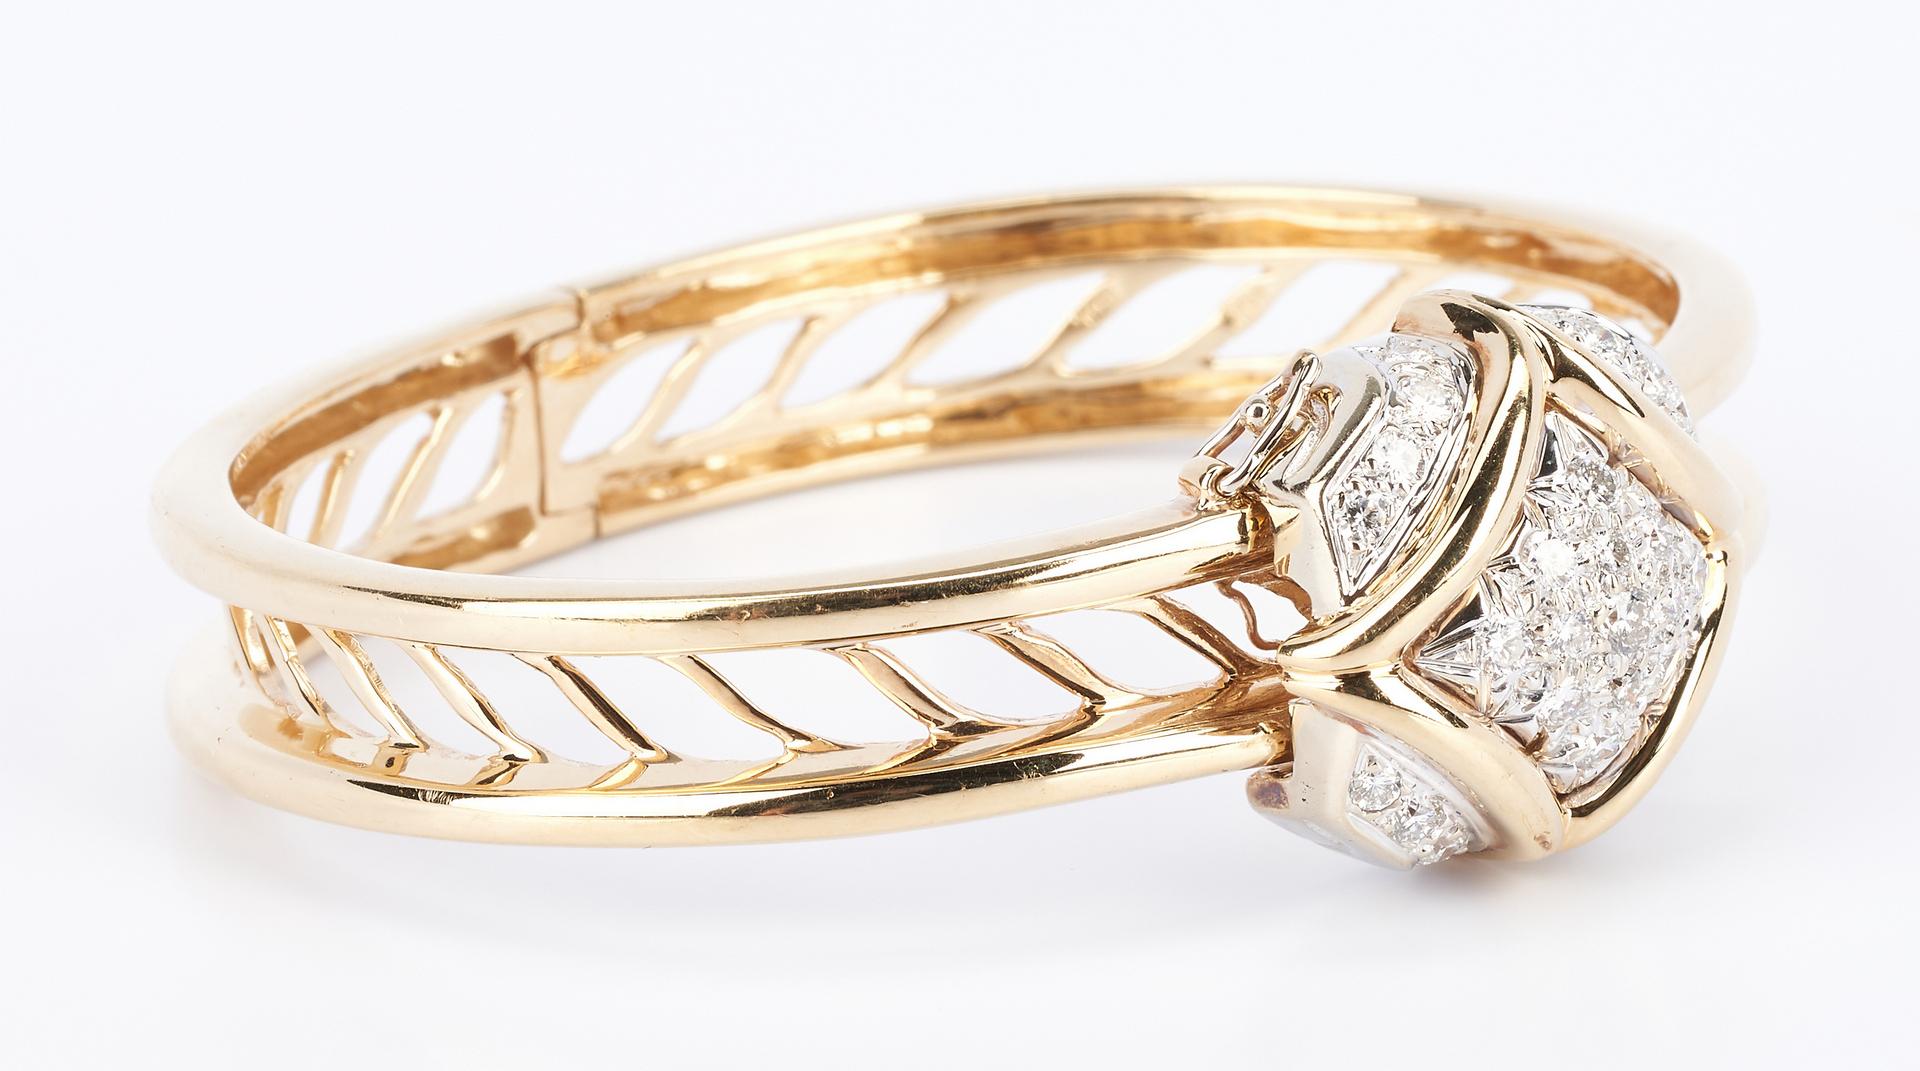 Lot 420: Ladies 14K Diamond Bangle Bracelet